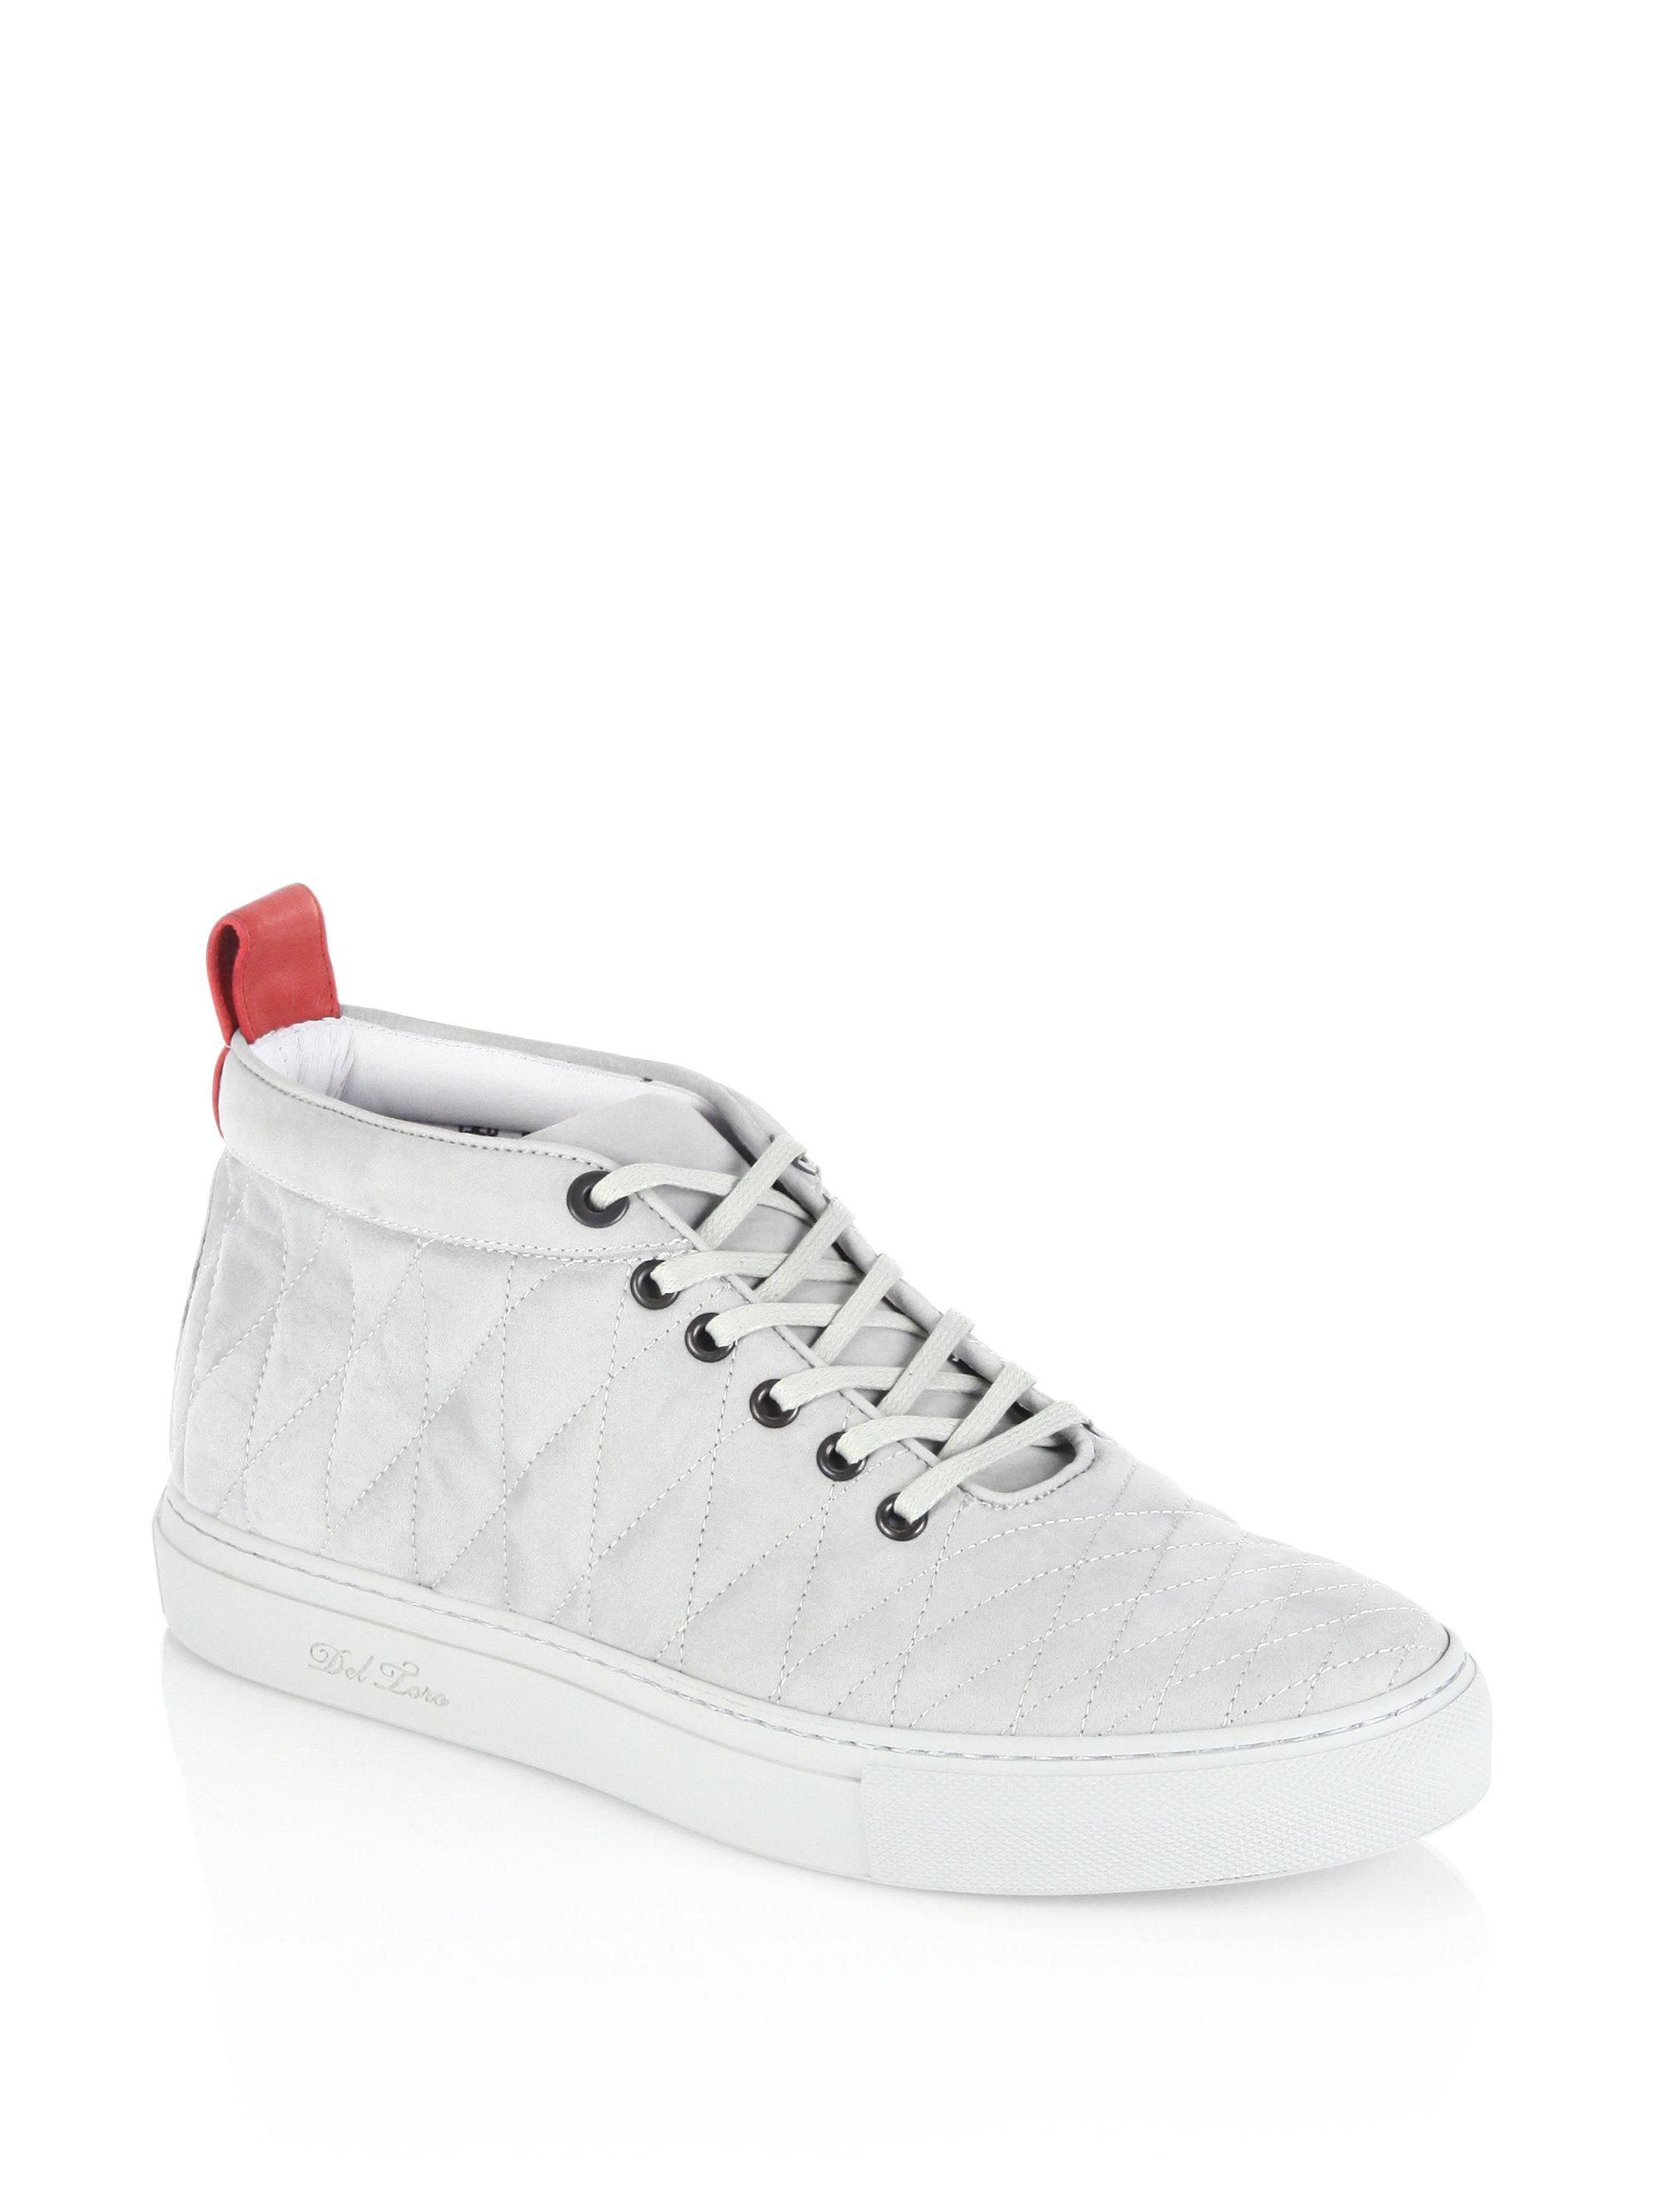 DEL TORO Alto Chukka Sneakers ALuupFM